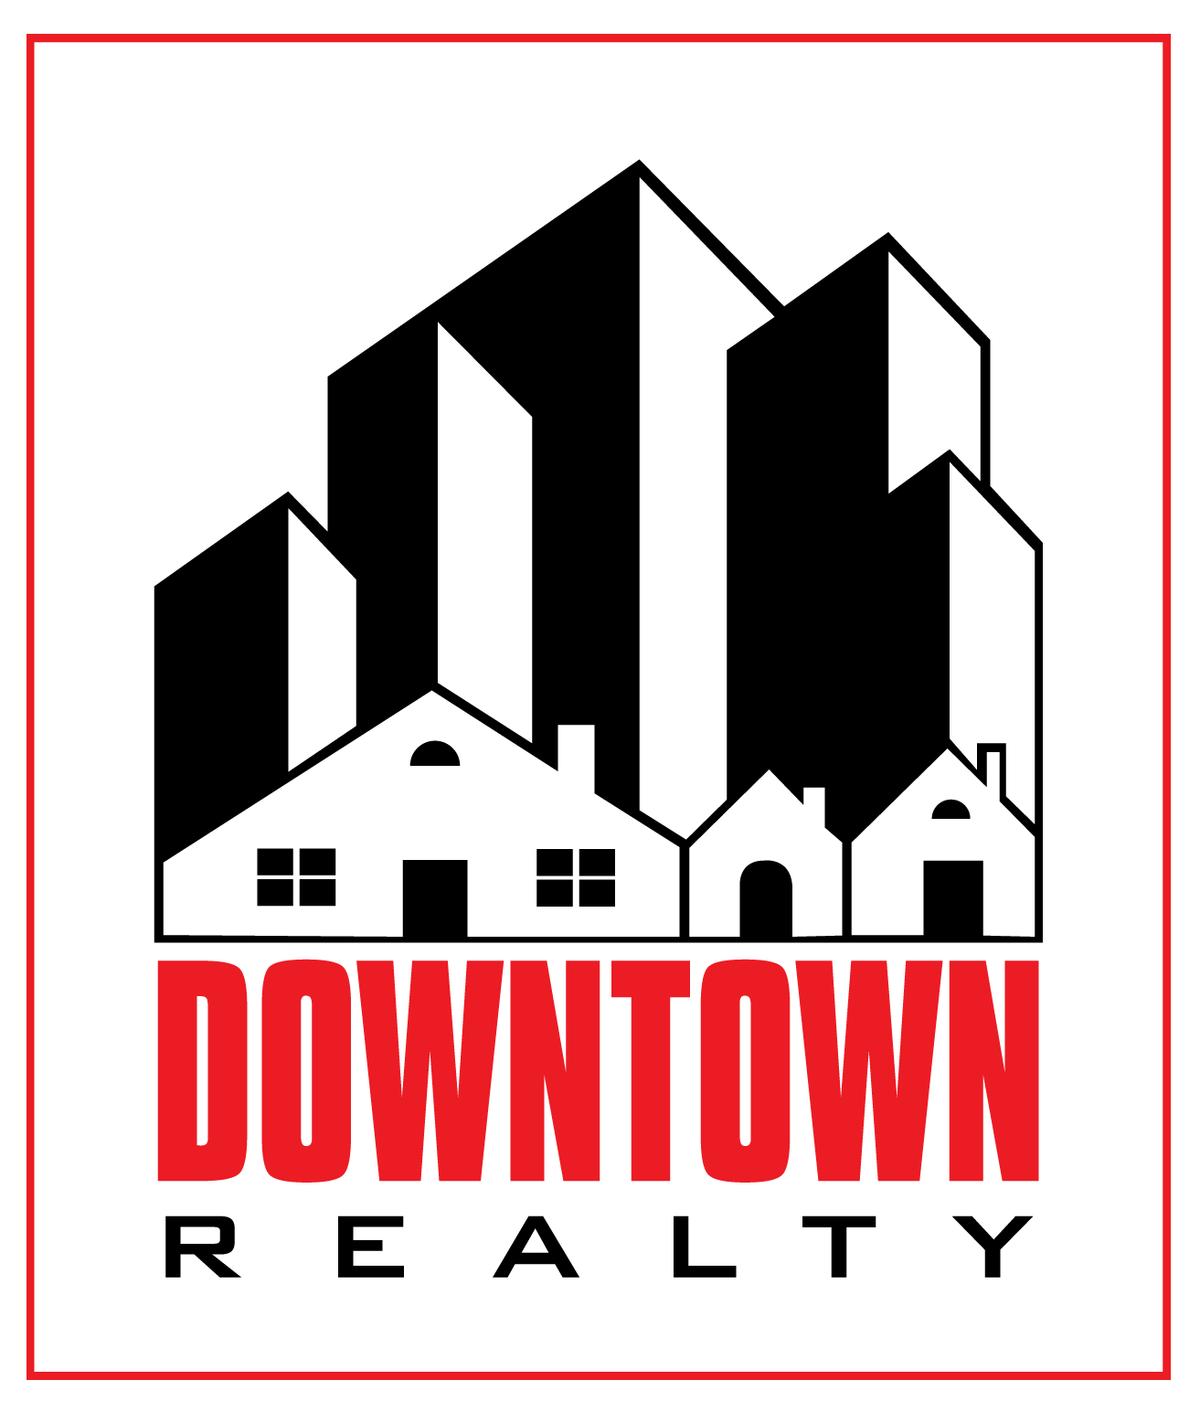 Fillmore Garden Apartments: Homes For Sale In Dexter / Fenkell